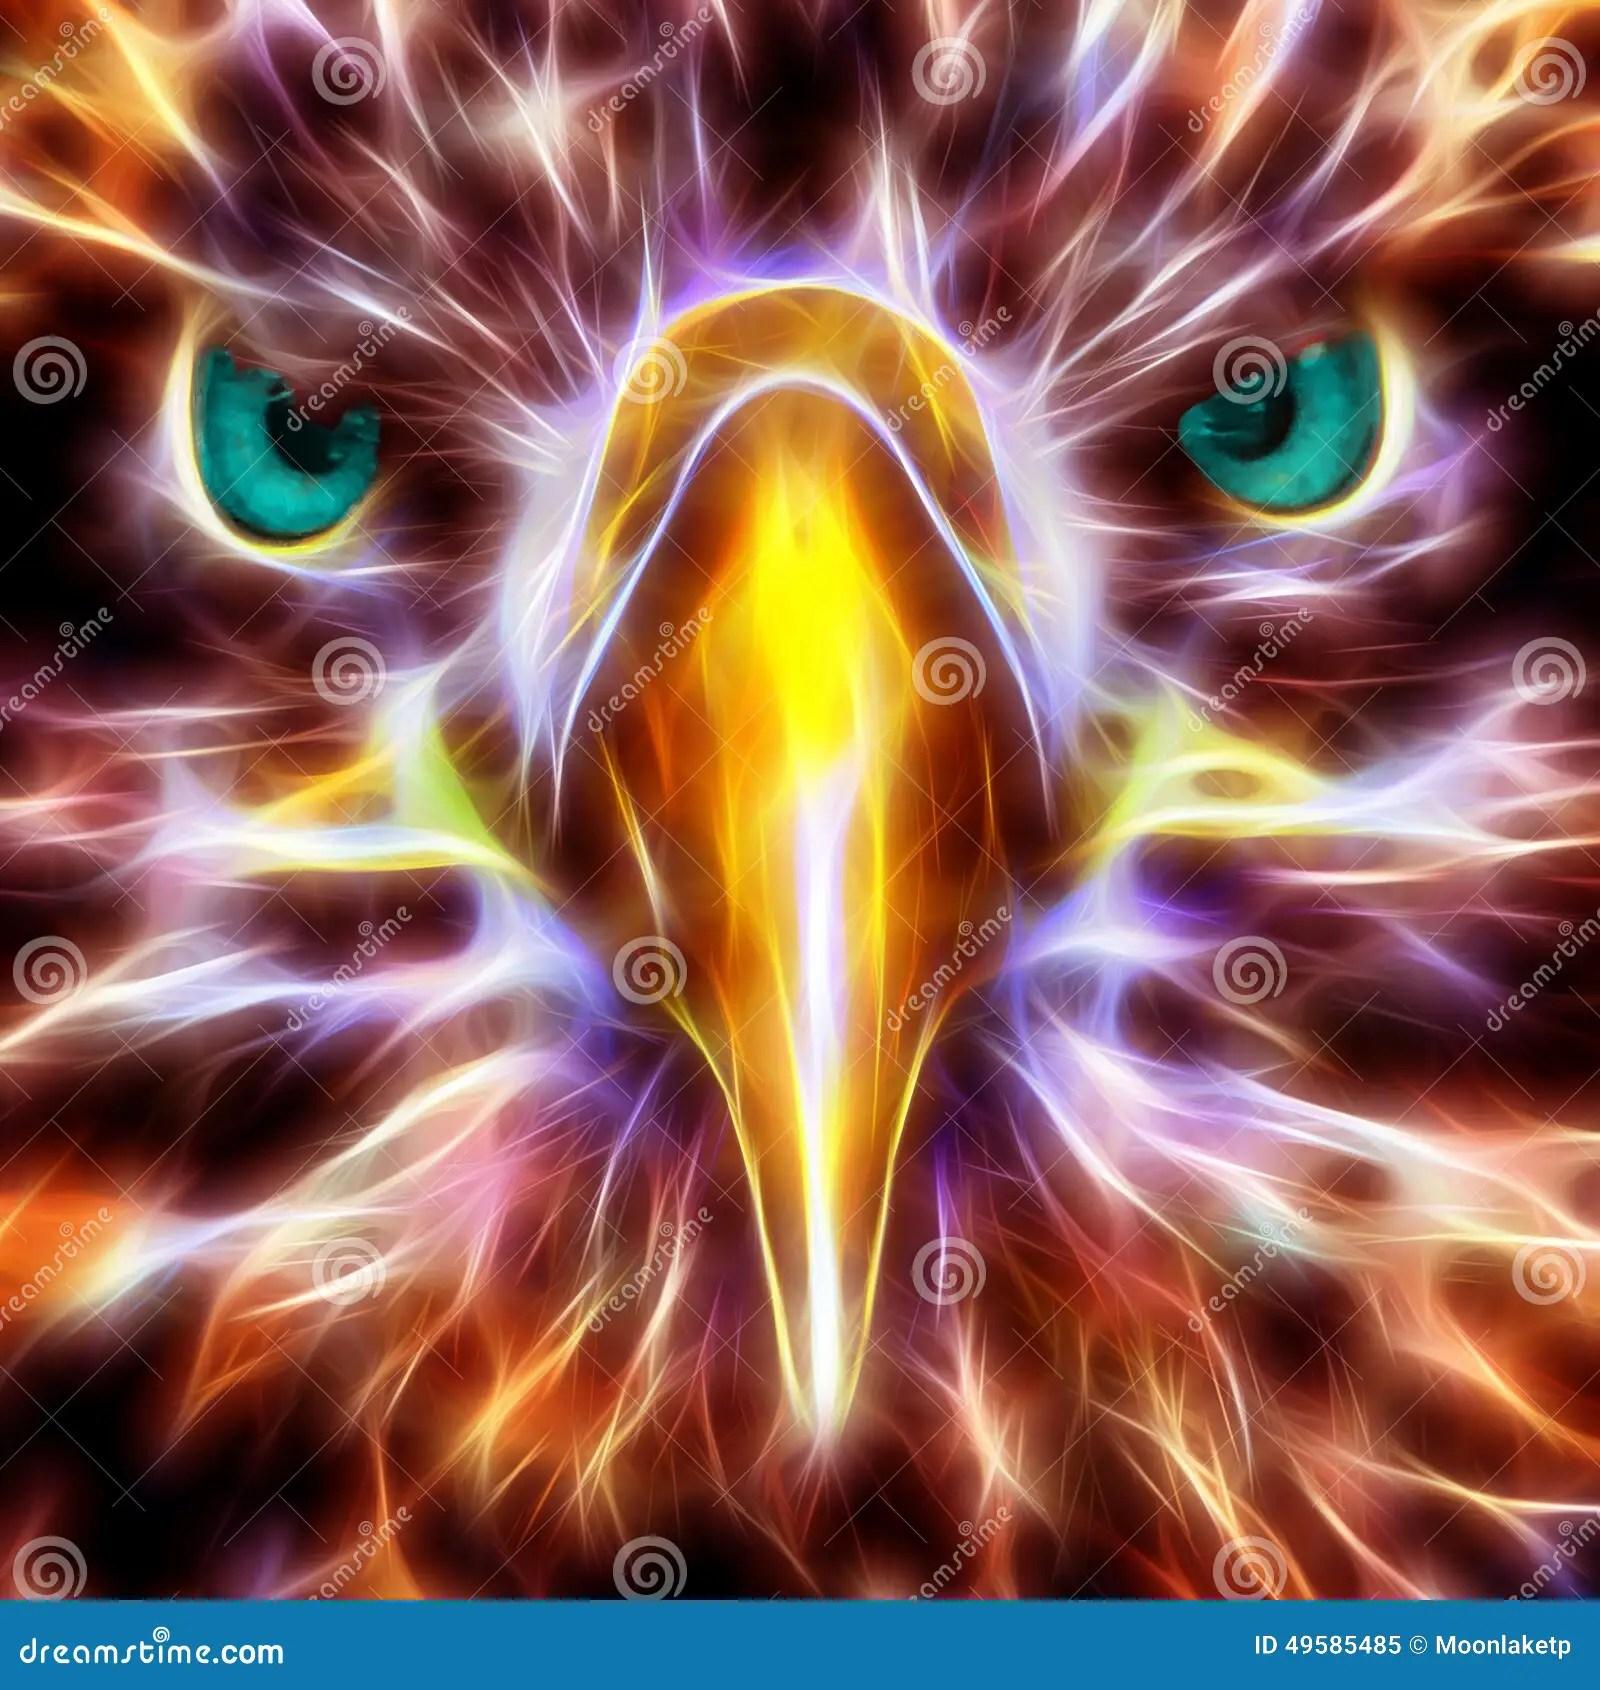 Neon Animal Print Wallpaper Abedabun The Sea Eagle Stock Illustration Image Of